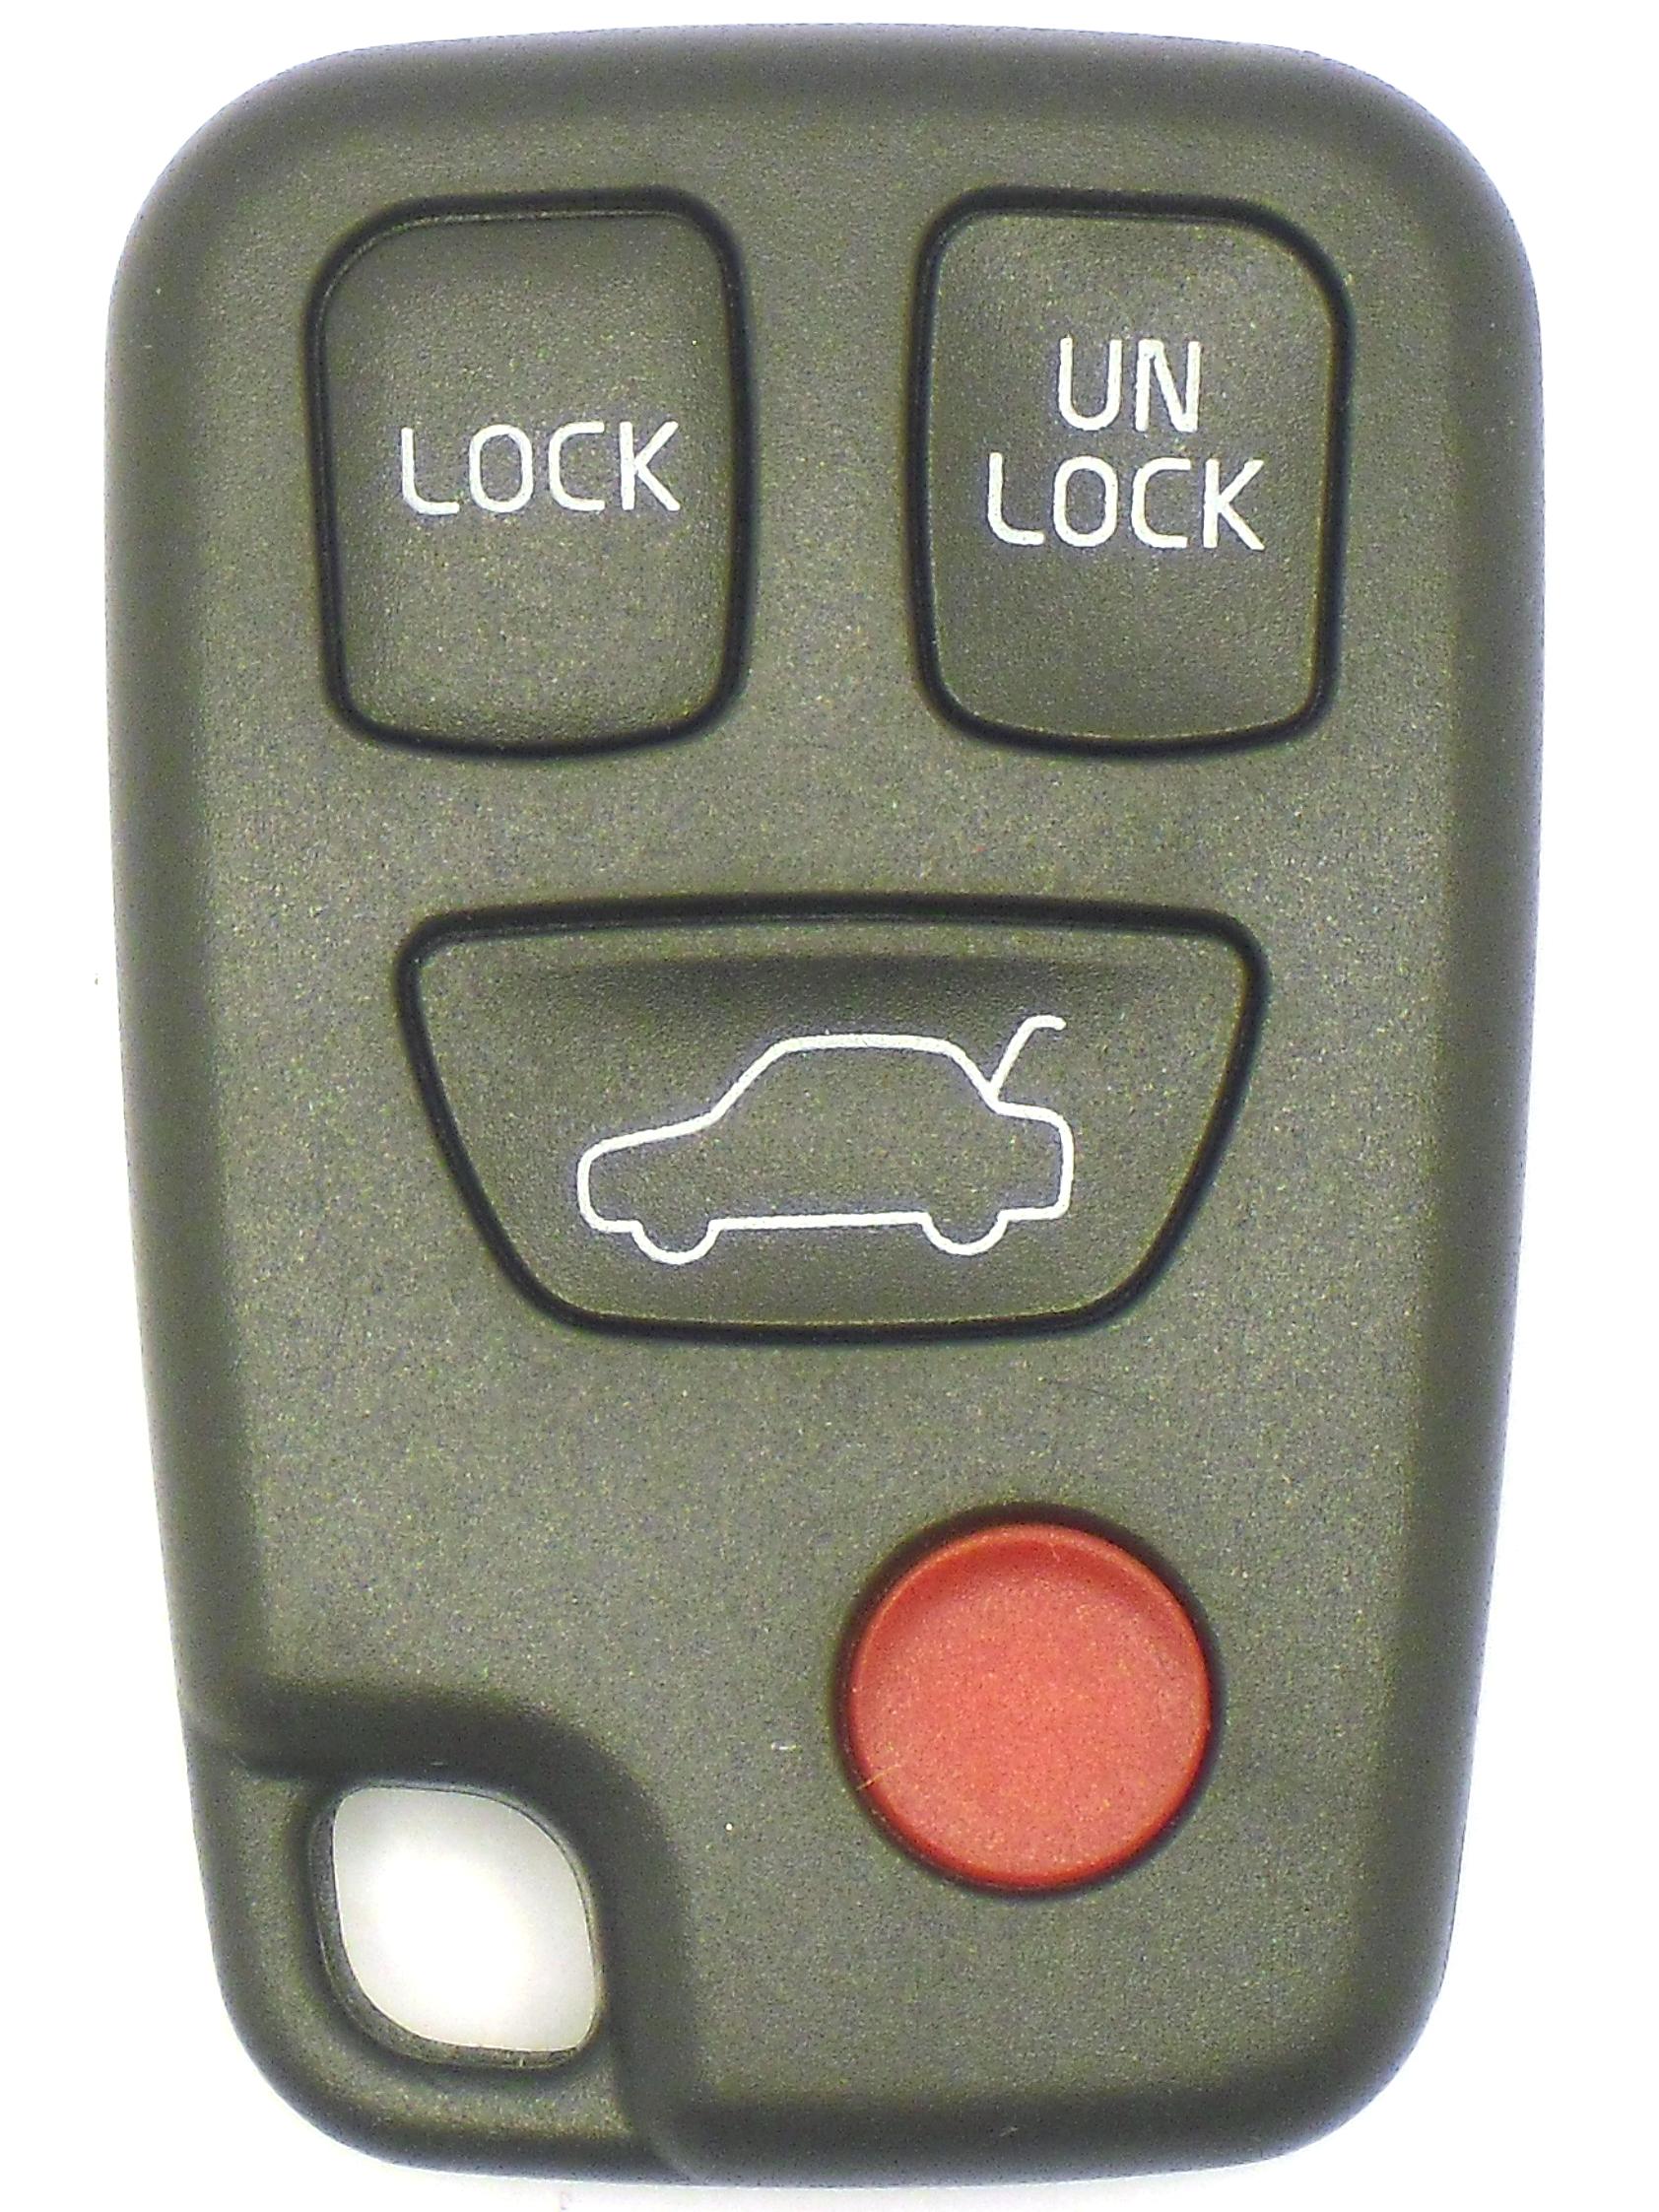 volvo keyless entry remote 4 button car keys express